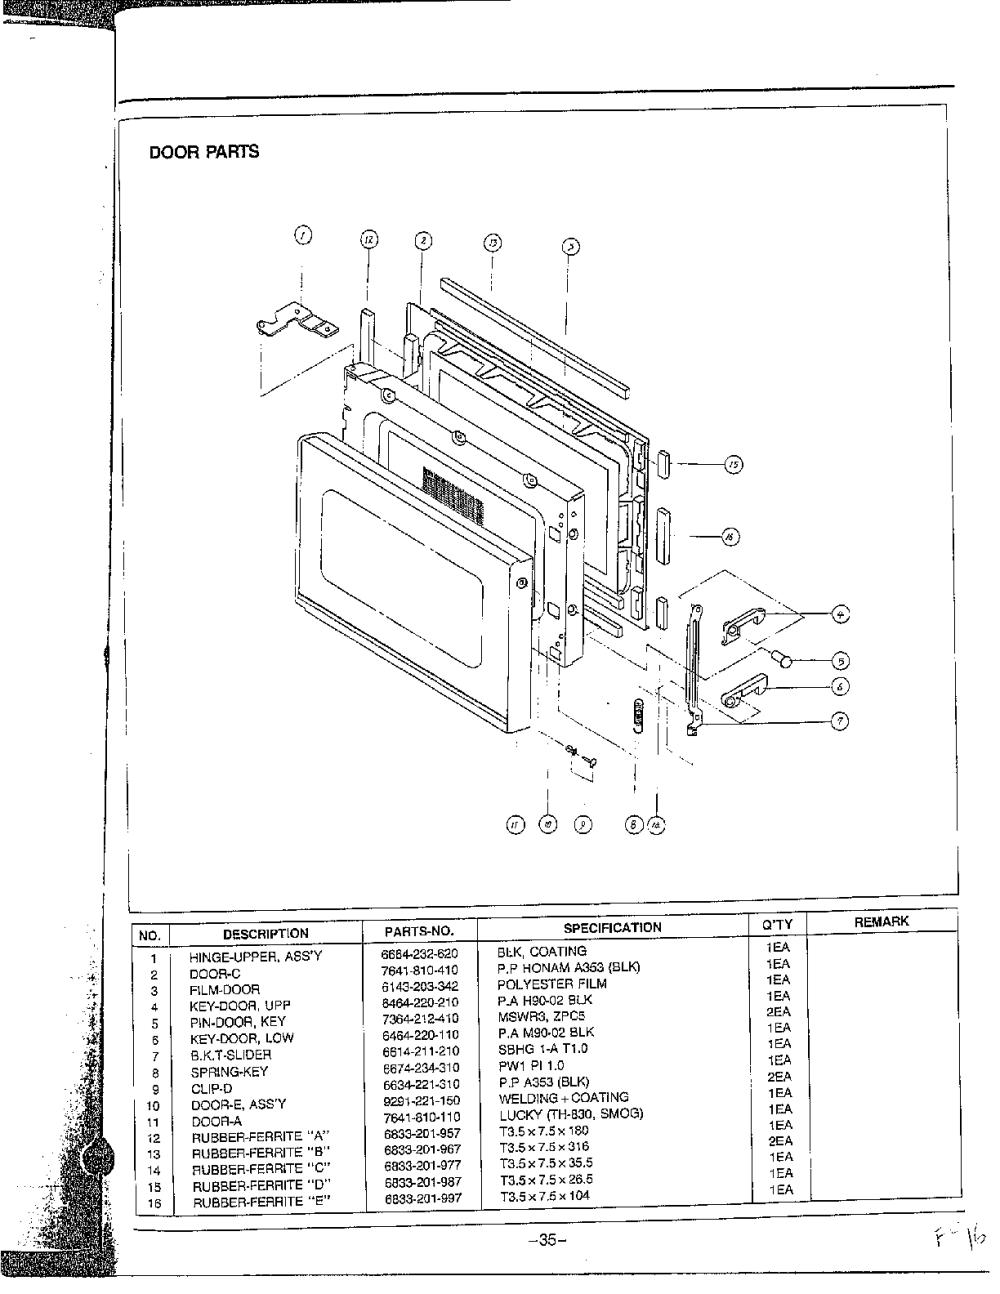 medium resolution of samsung samsung microwave oven parts model mw5350w xaa sears rh searspartsdirect com amana radarange microwave oven parts diagram sharp microwave oven parts